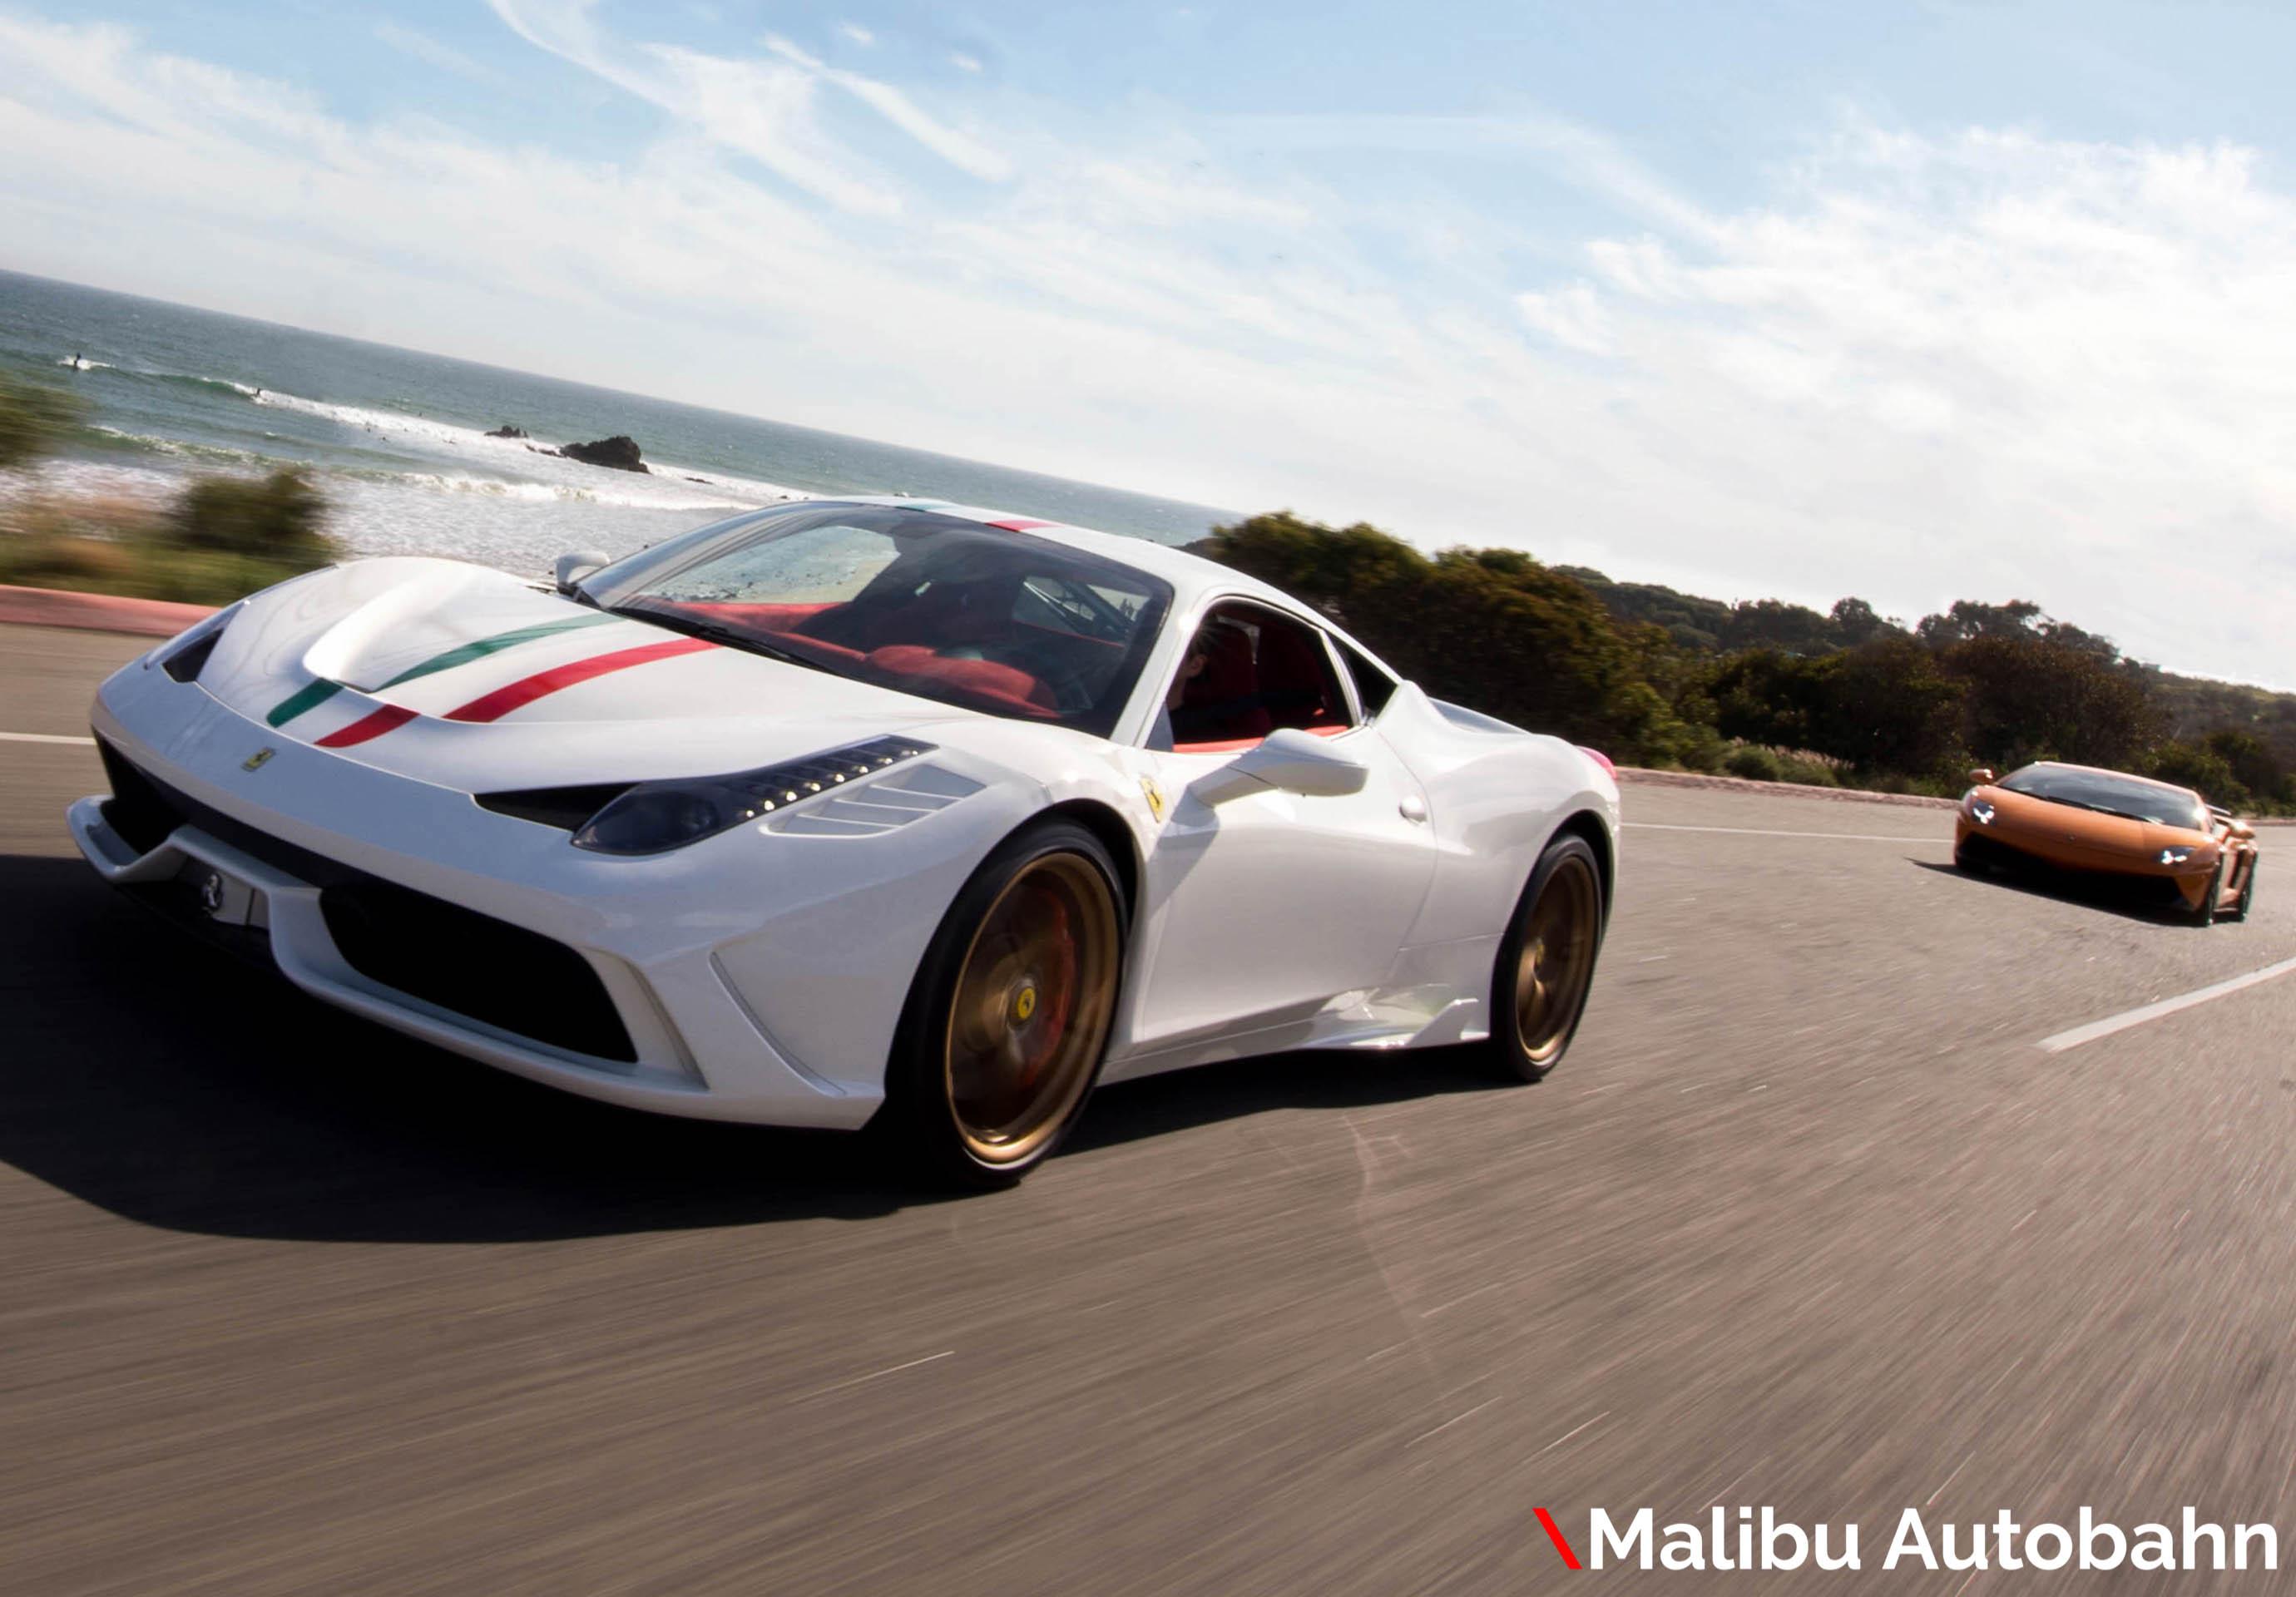 Malibu Autoban Ferrari Lambo Rolls